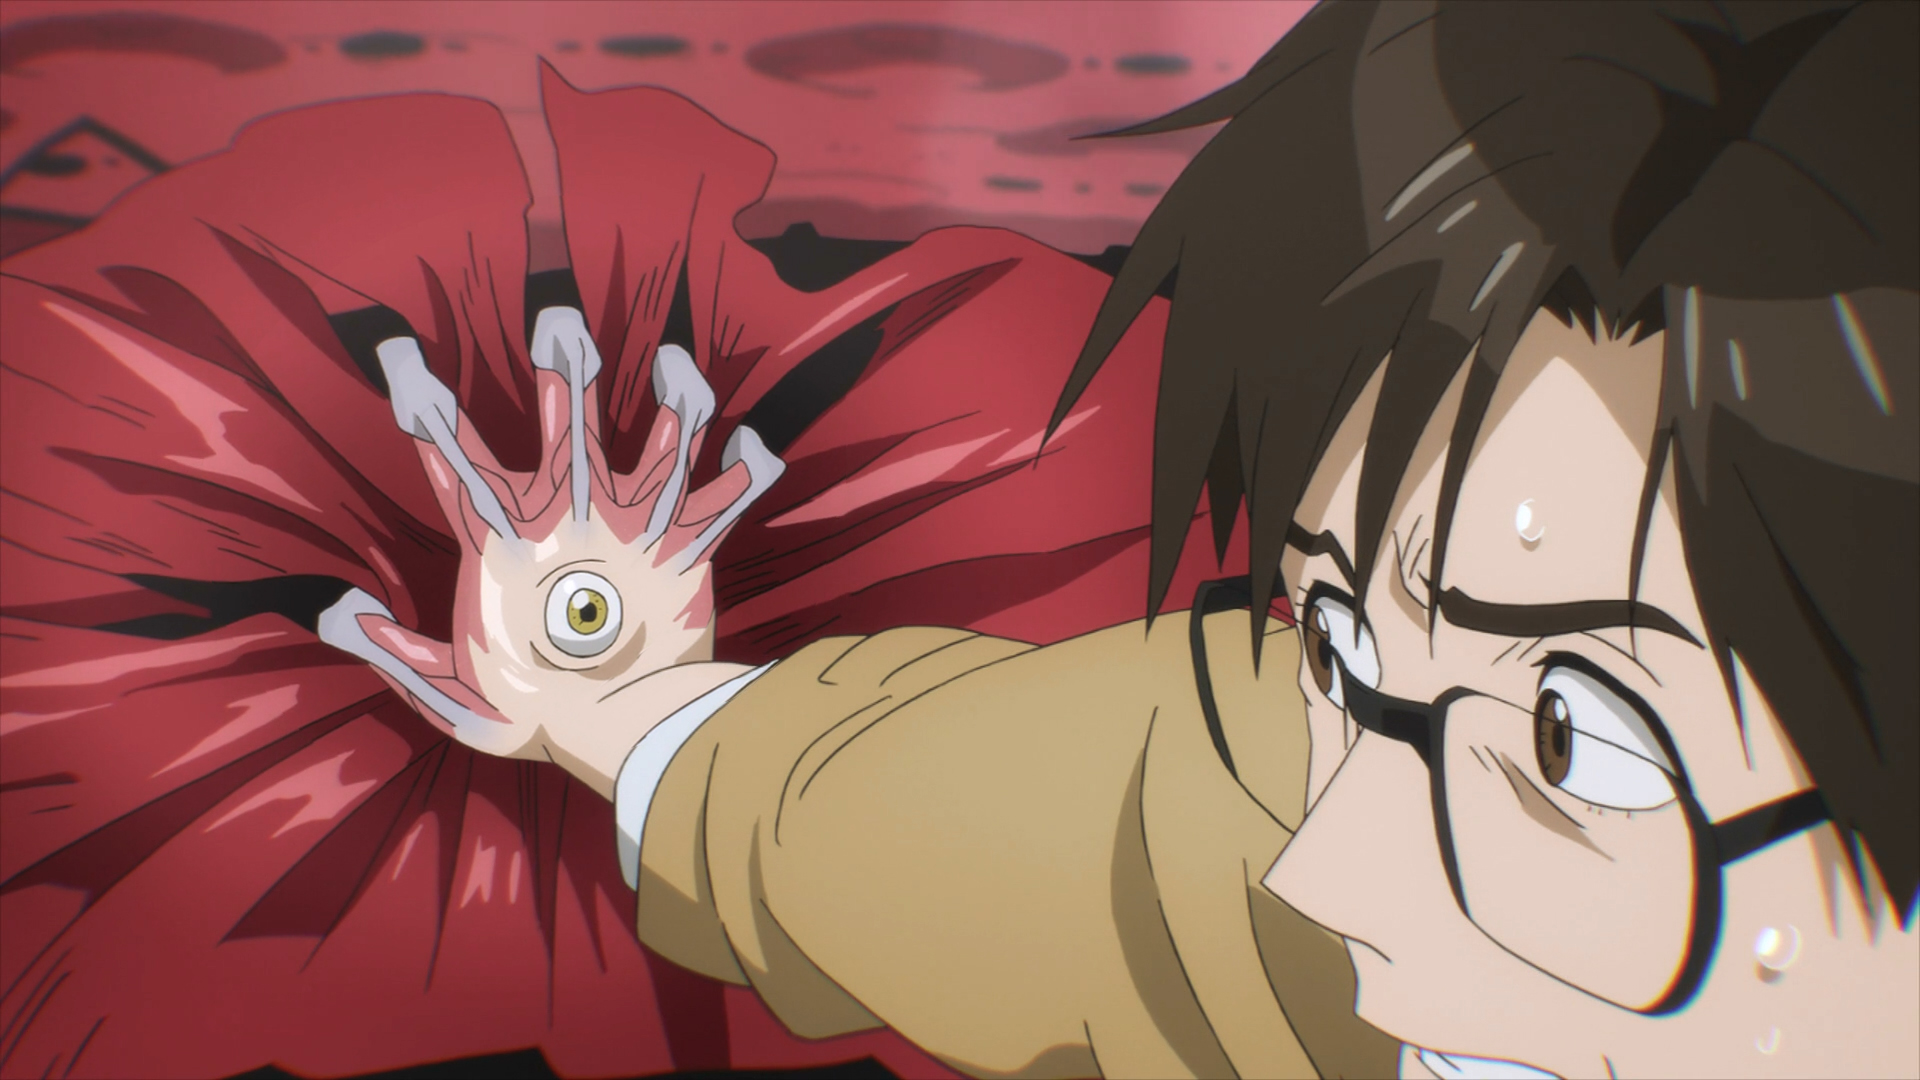 Anime   Parasyte  the Maxim  Izumi Shinichi Fond dcran 1920x1080